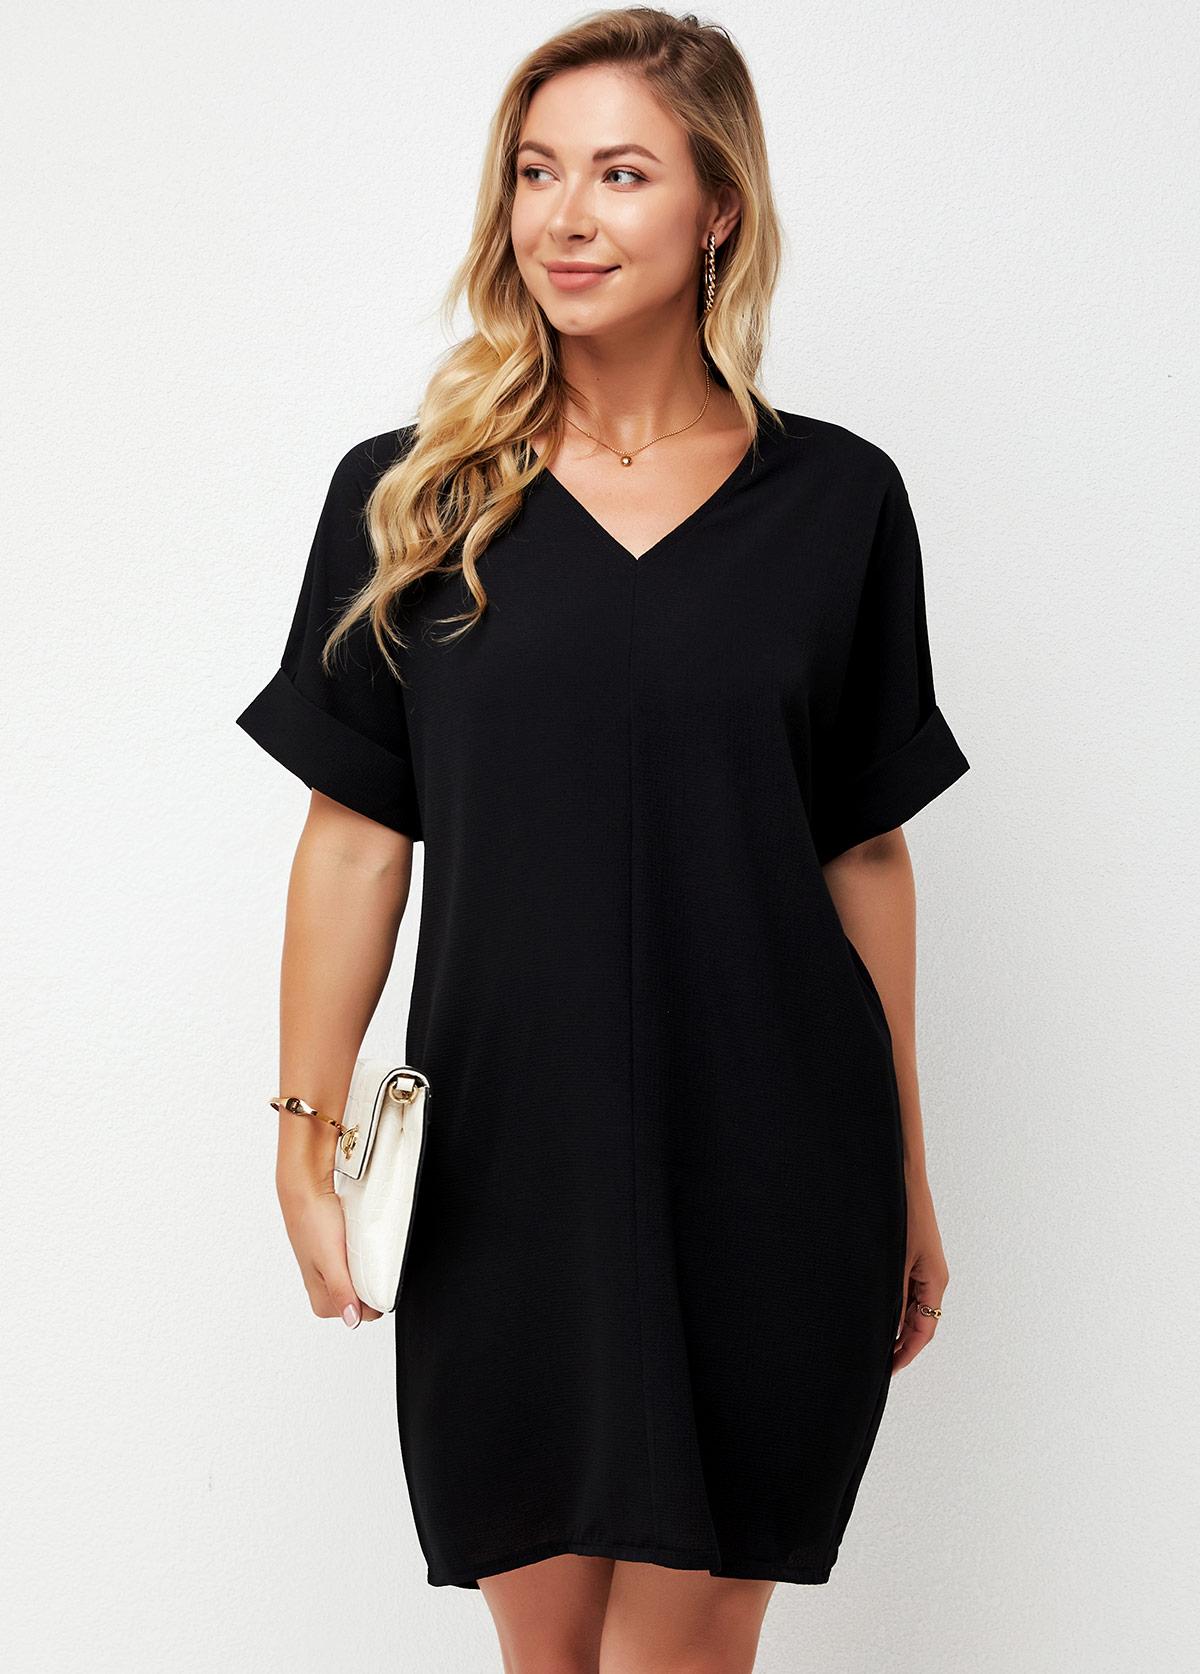 V Neck Black Short Sleeve Dress